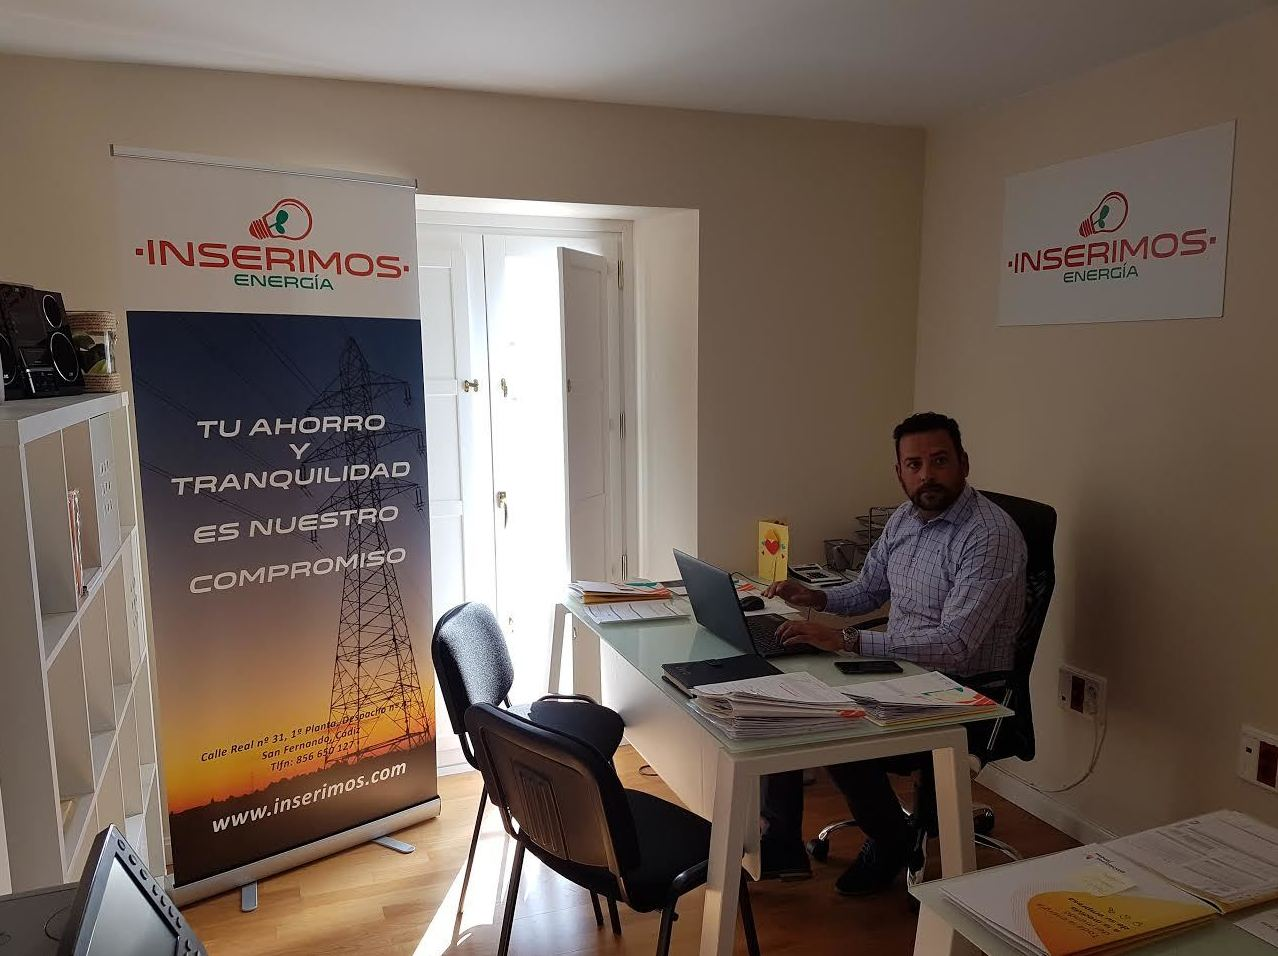 Insérimos Cádiz|Comercializadora eléctrica y gas